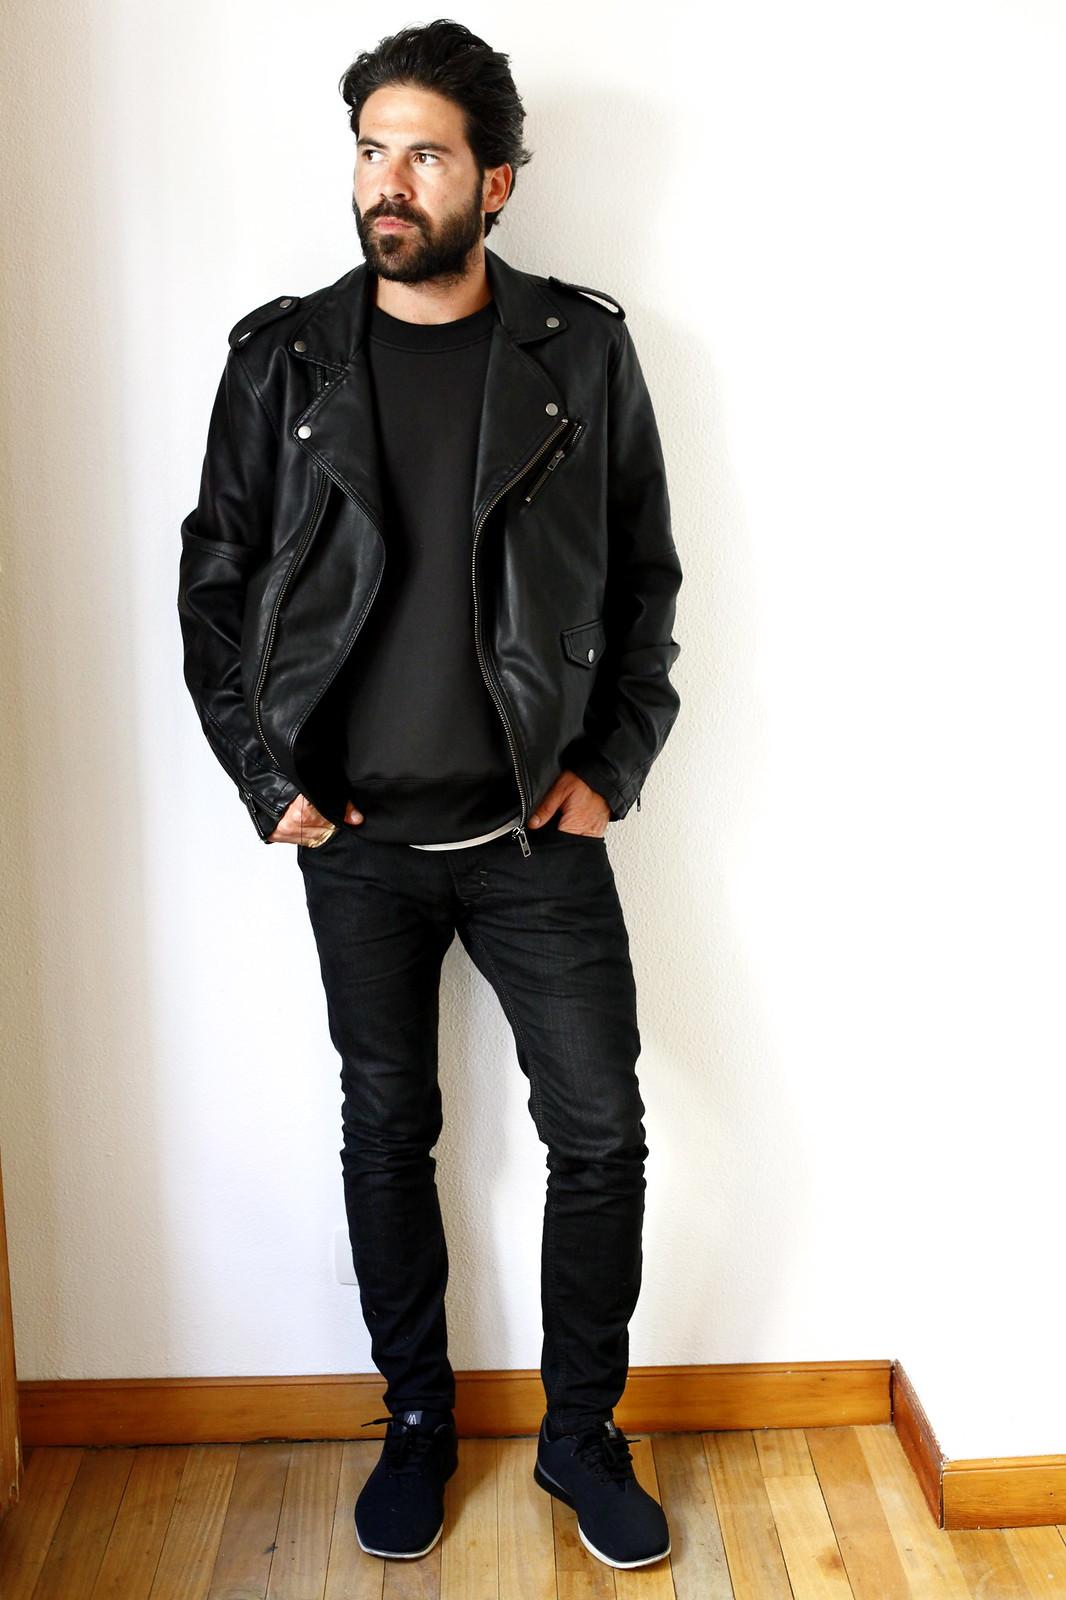 miguel_carrizo_ilcarritzi_look_total_black_asos_h&m_diesel_muro_exe_